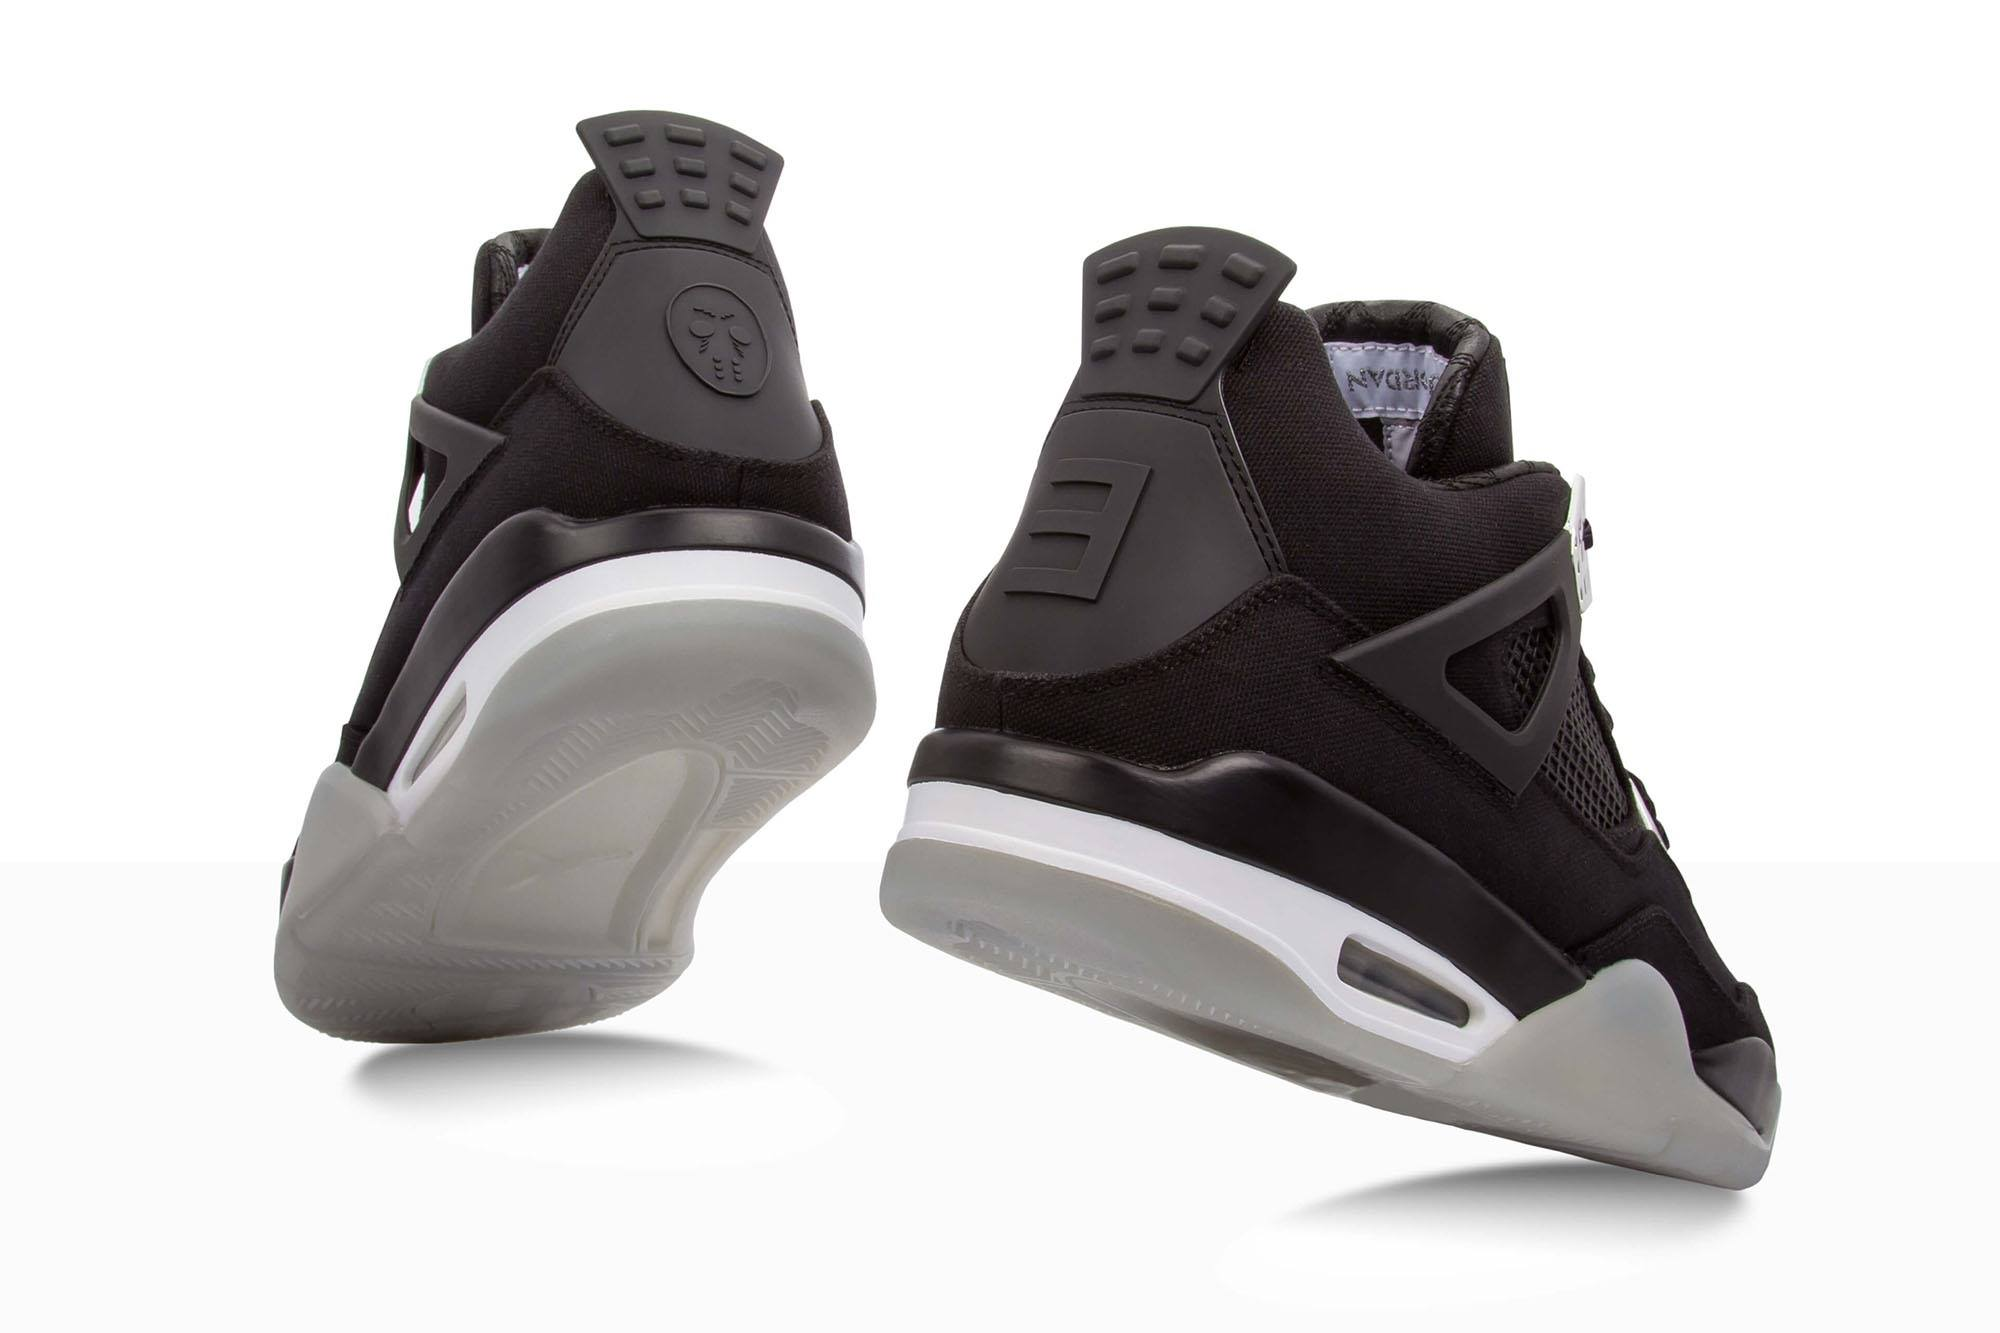 eminem sneakers ebay, eminem air jordan iv ebay, eminem jordan carhartt, eminem jordan carhartt sneakers, eminem snearkers shady records